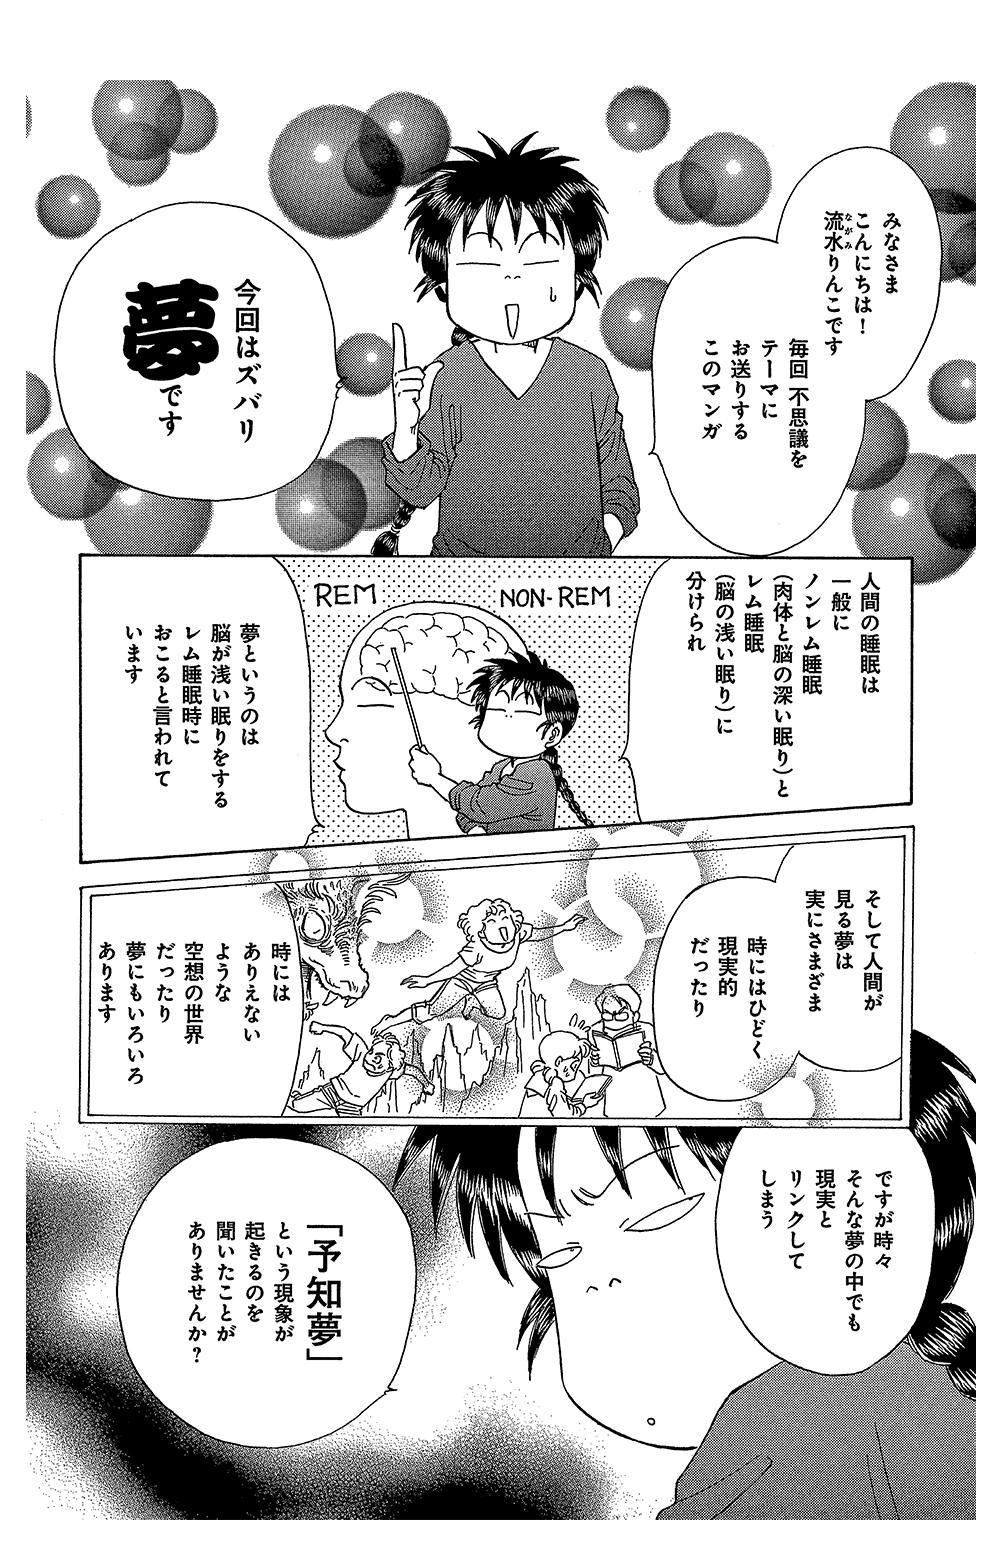 okaruto2-1-3.jpg